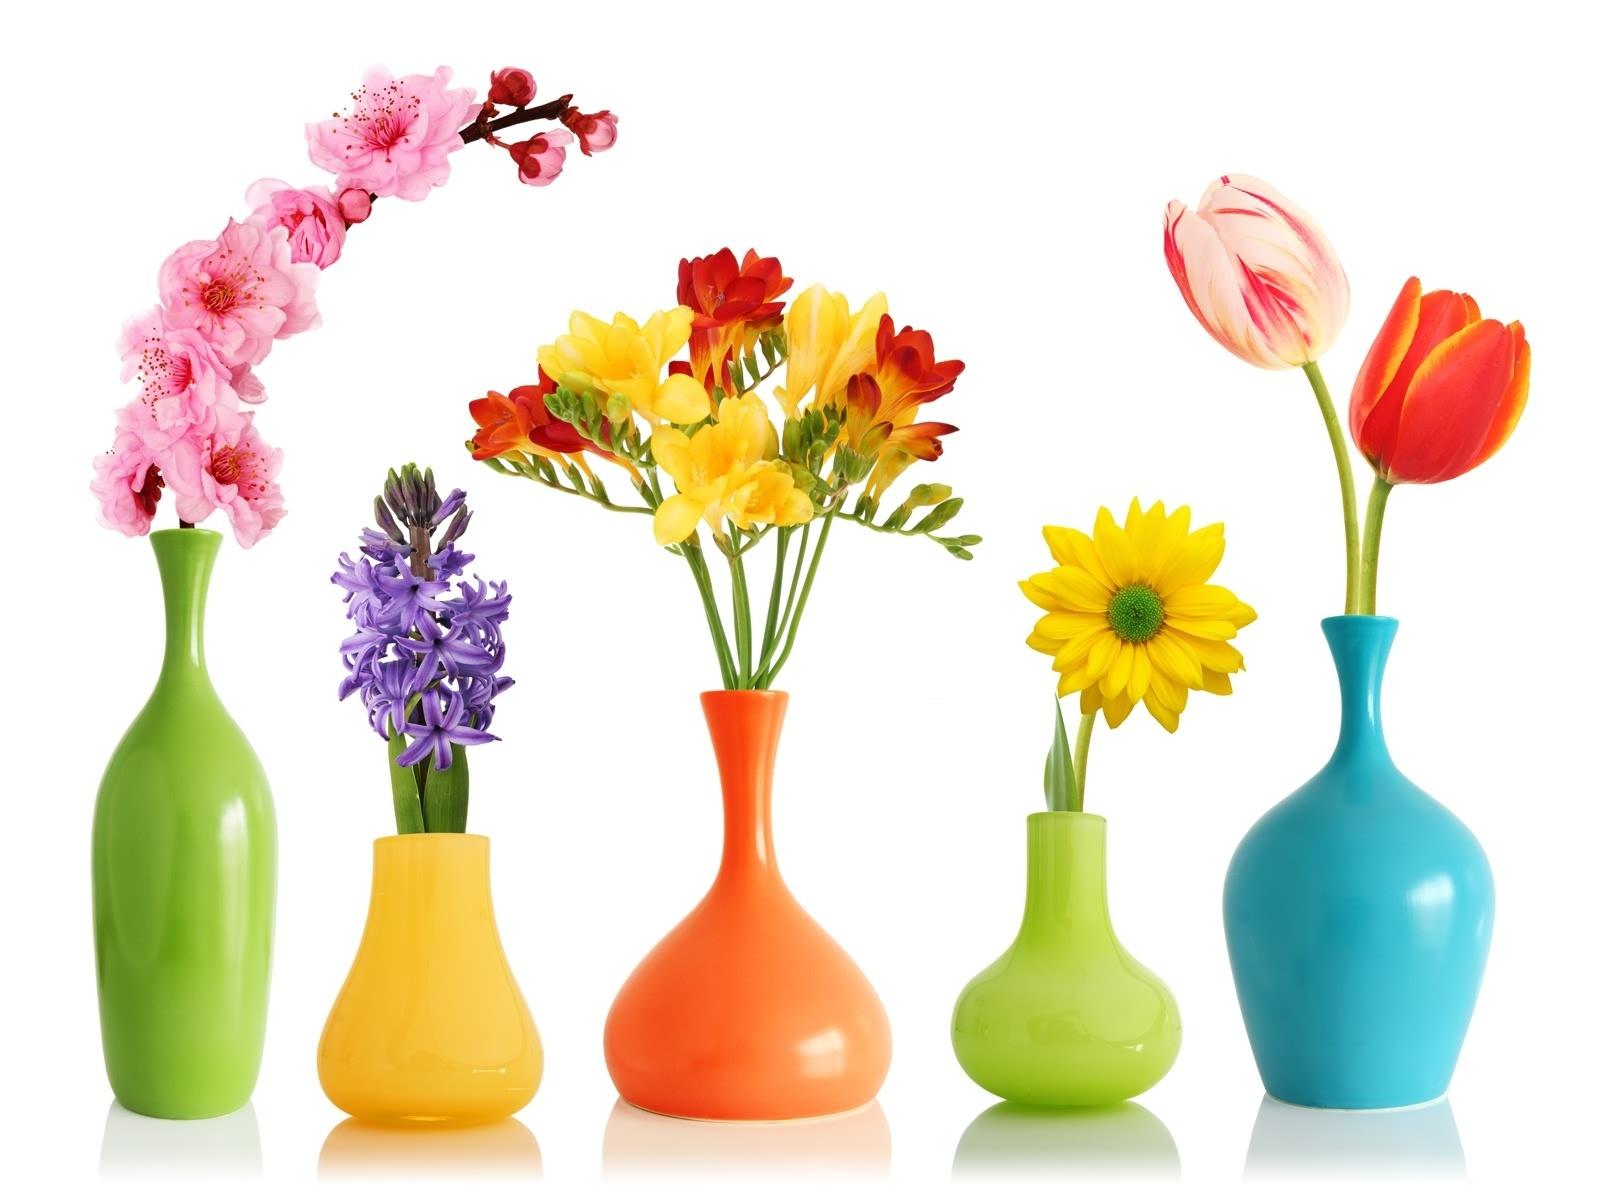 vase wallpaper hd 24 1600x1200